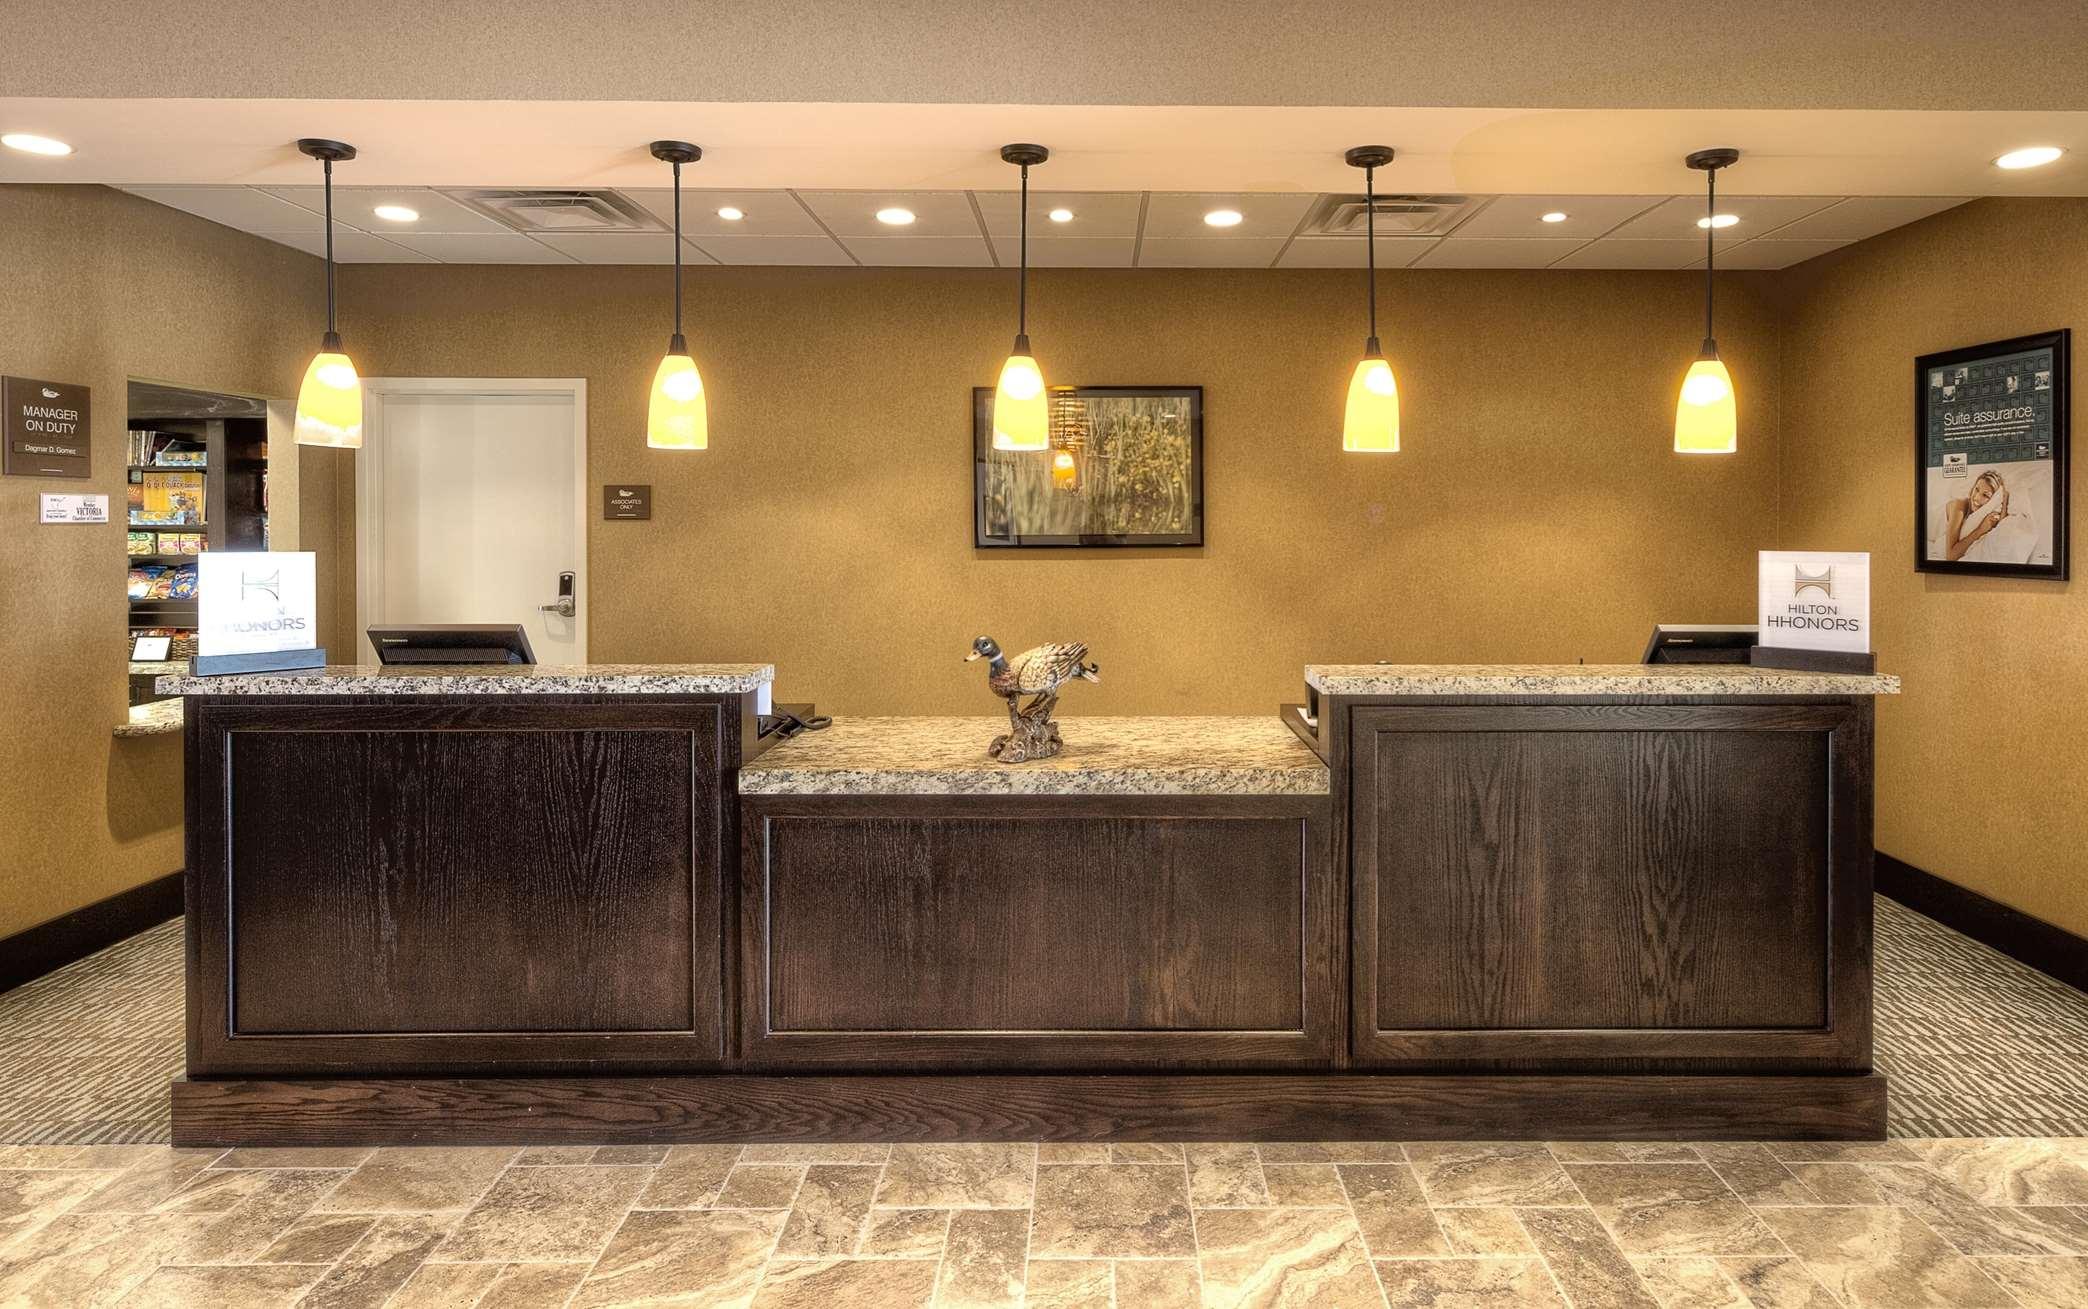 Homewood Suites by Hilton Victoria, TX image 5